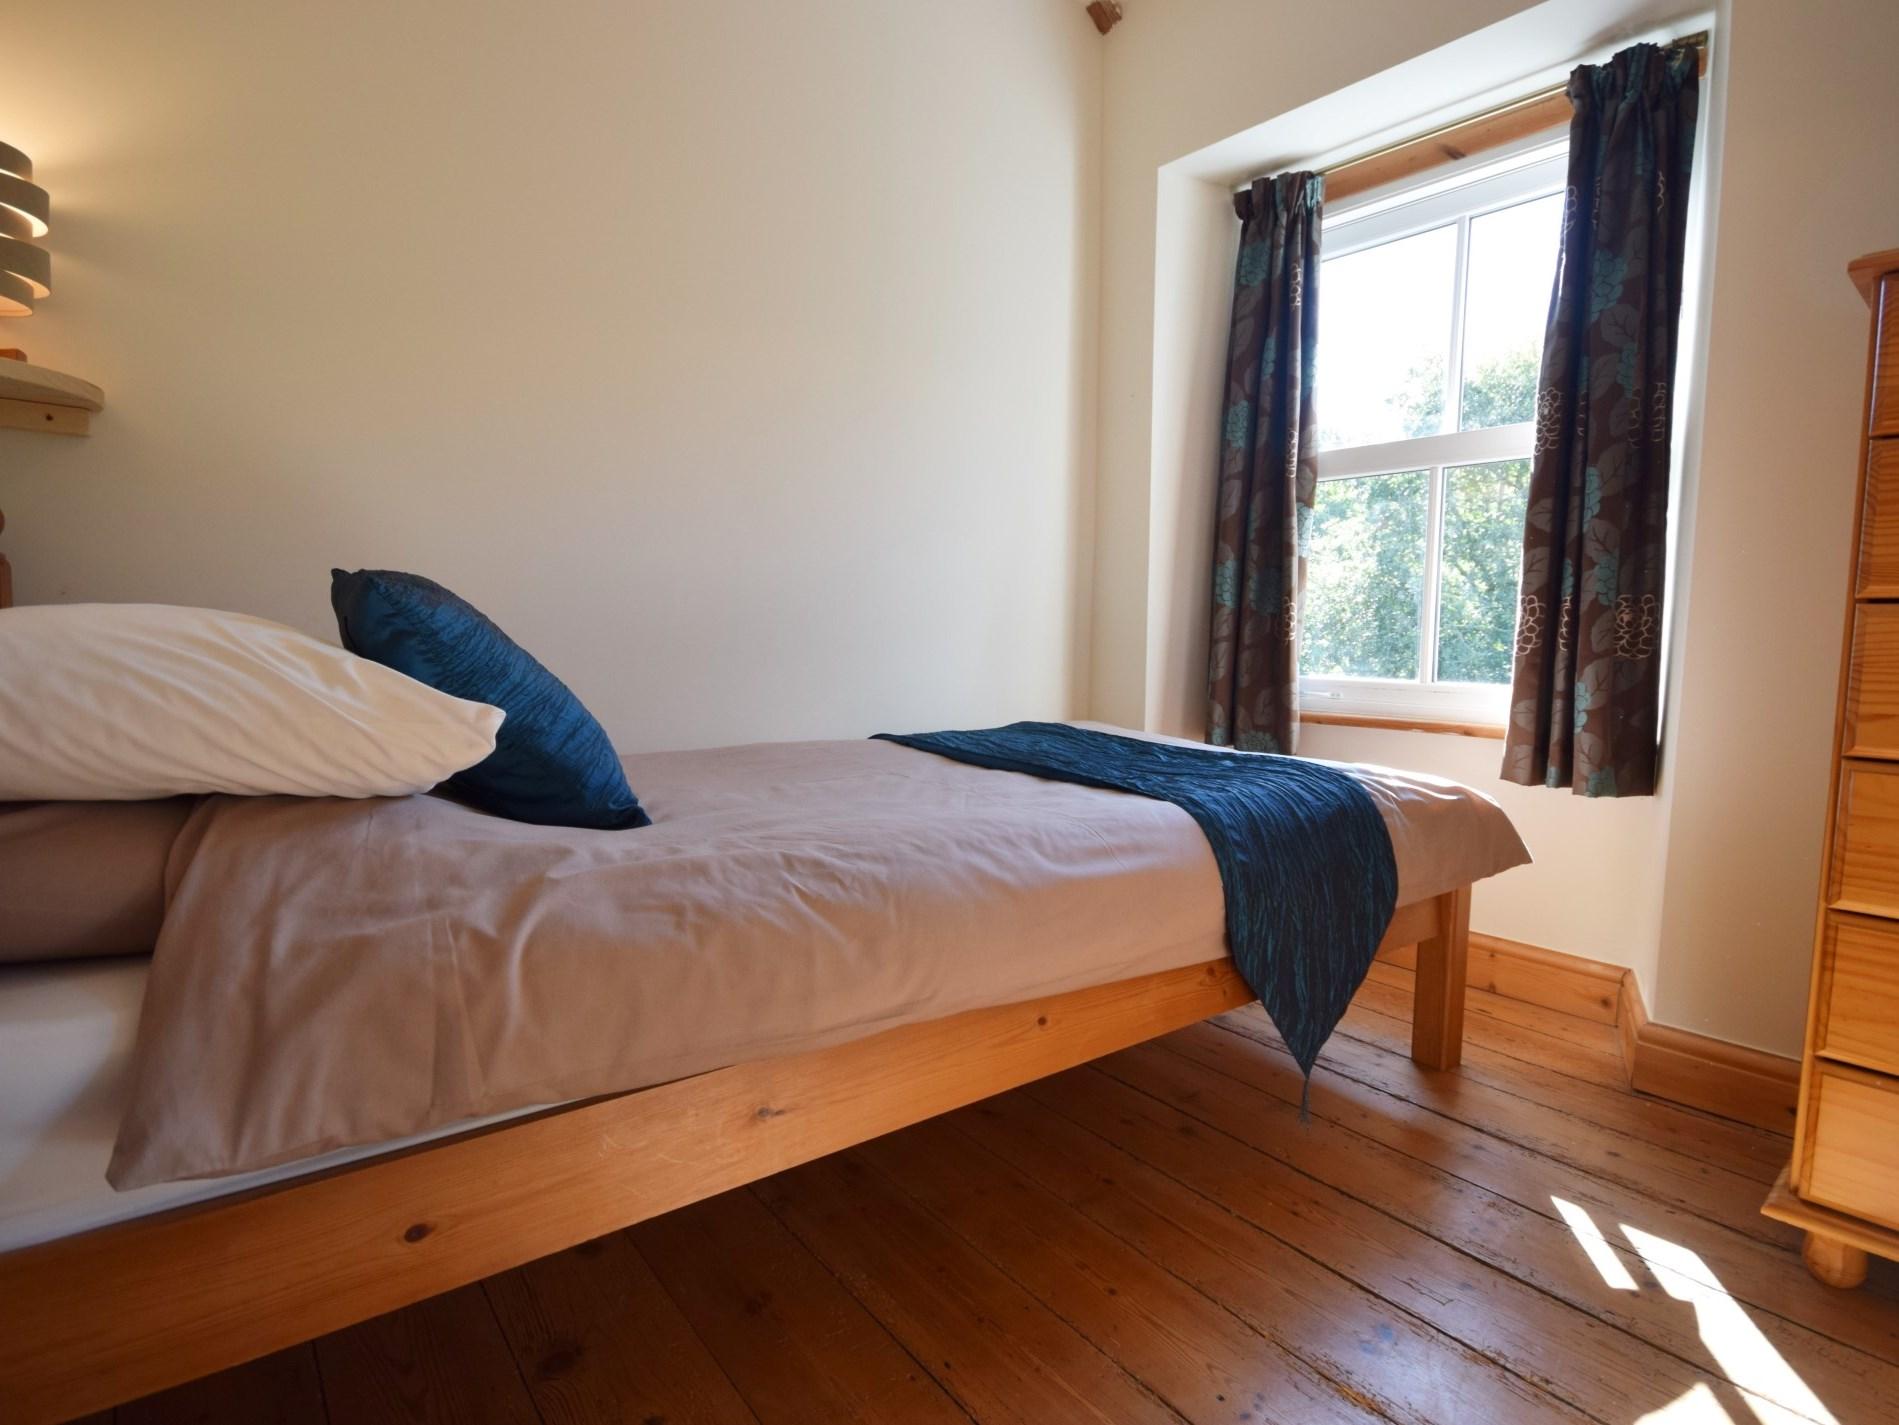 6 Bedroom House in North Devon, Cornwall